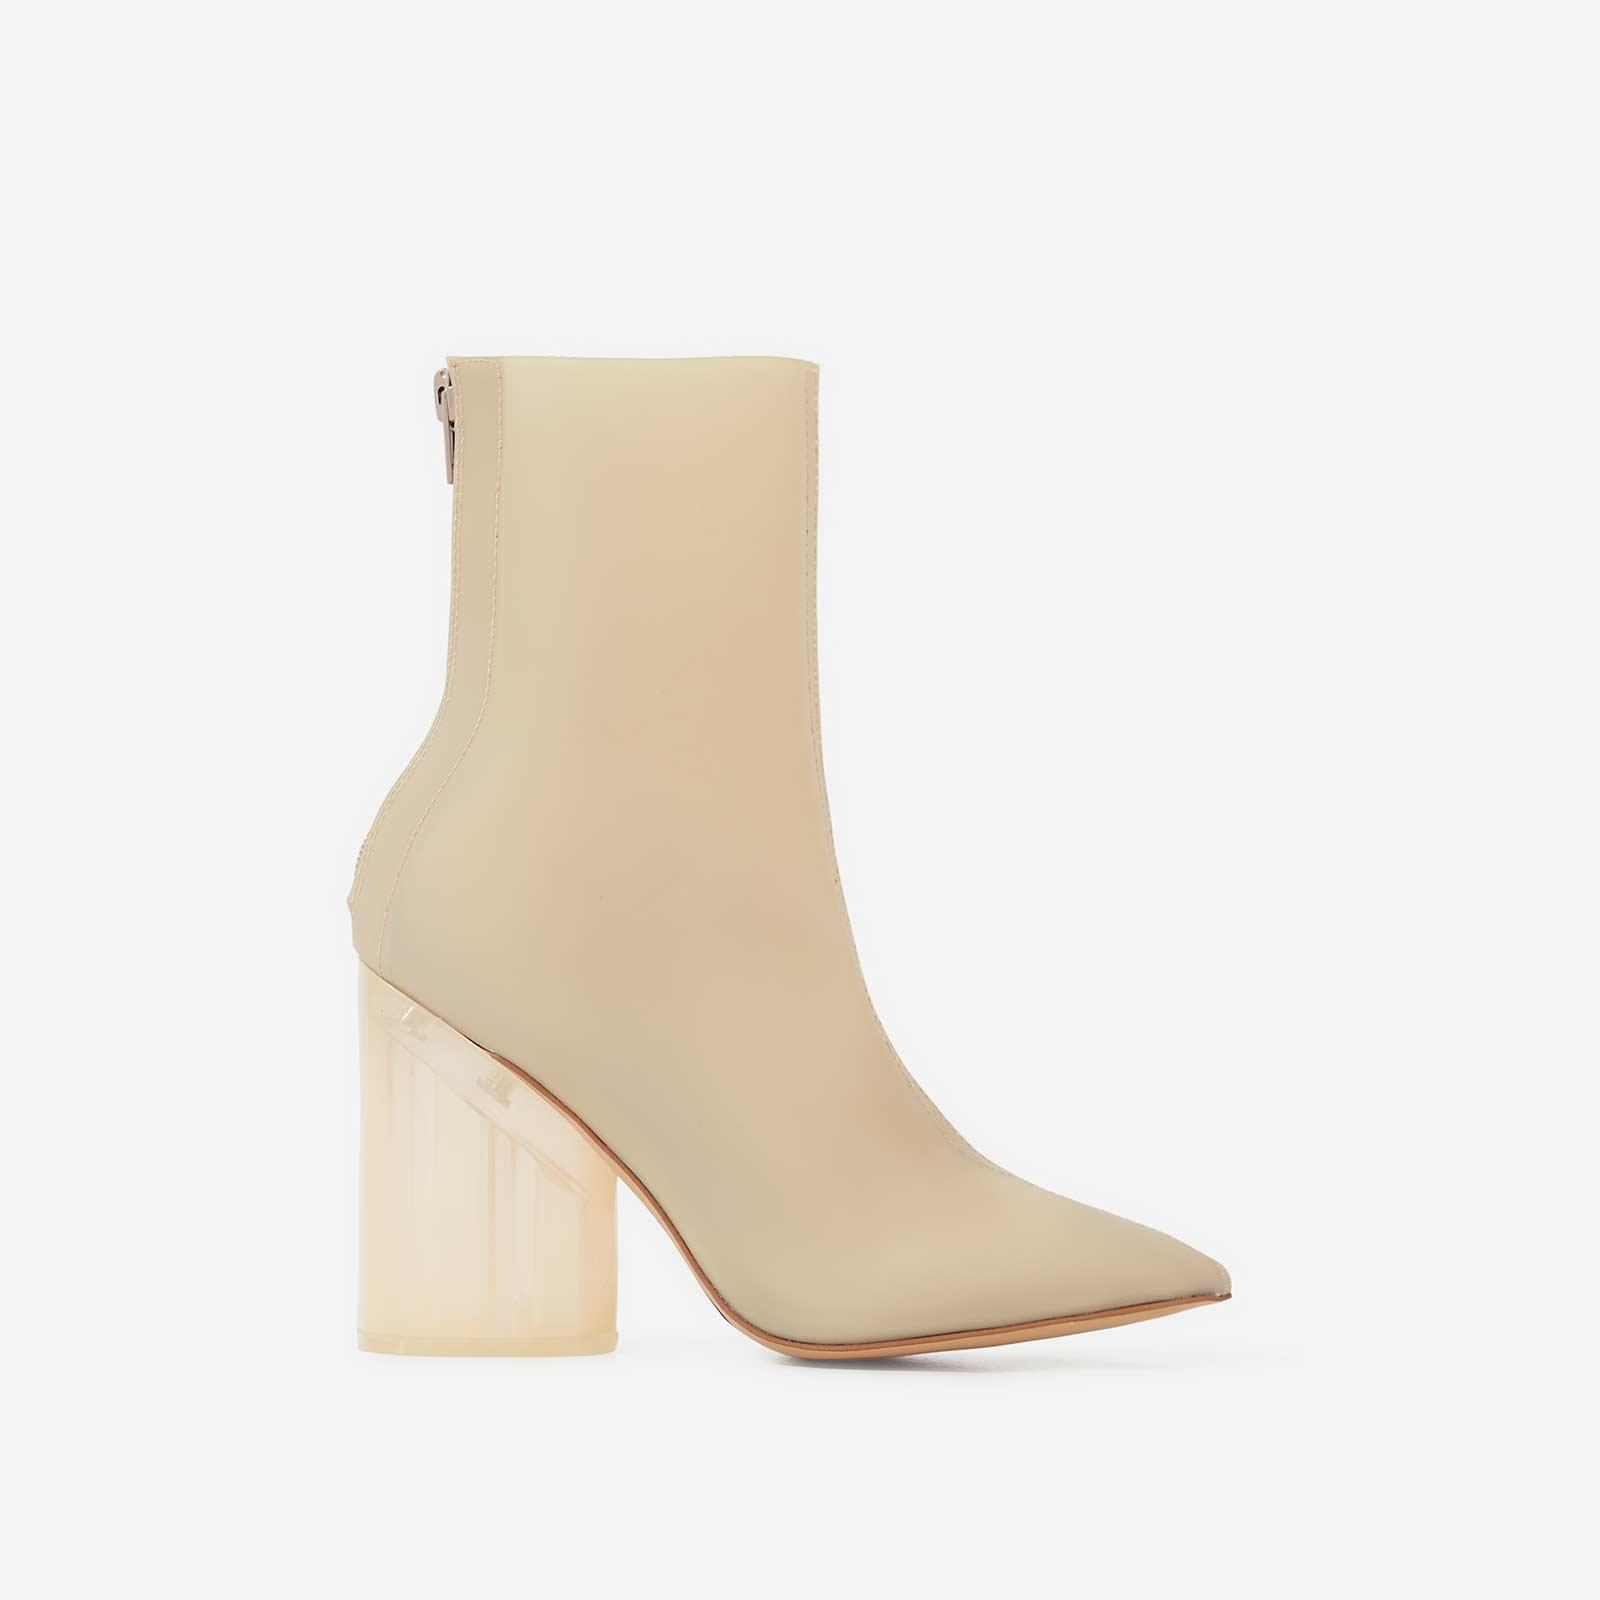 Mimi Perspex Block Heel Pointed Ankle Sock Boot In Matt Nude